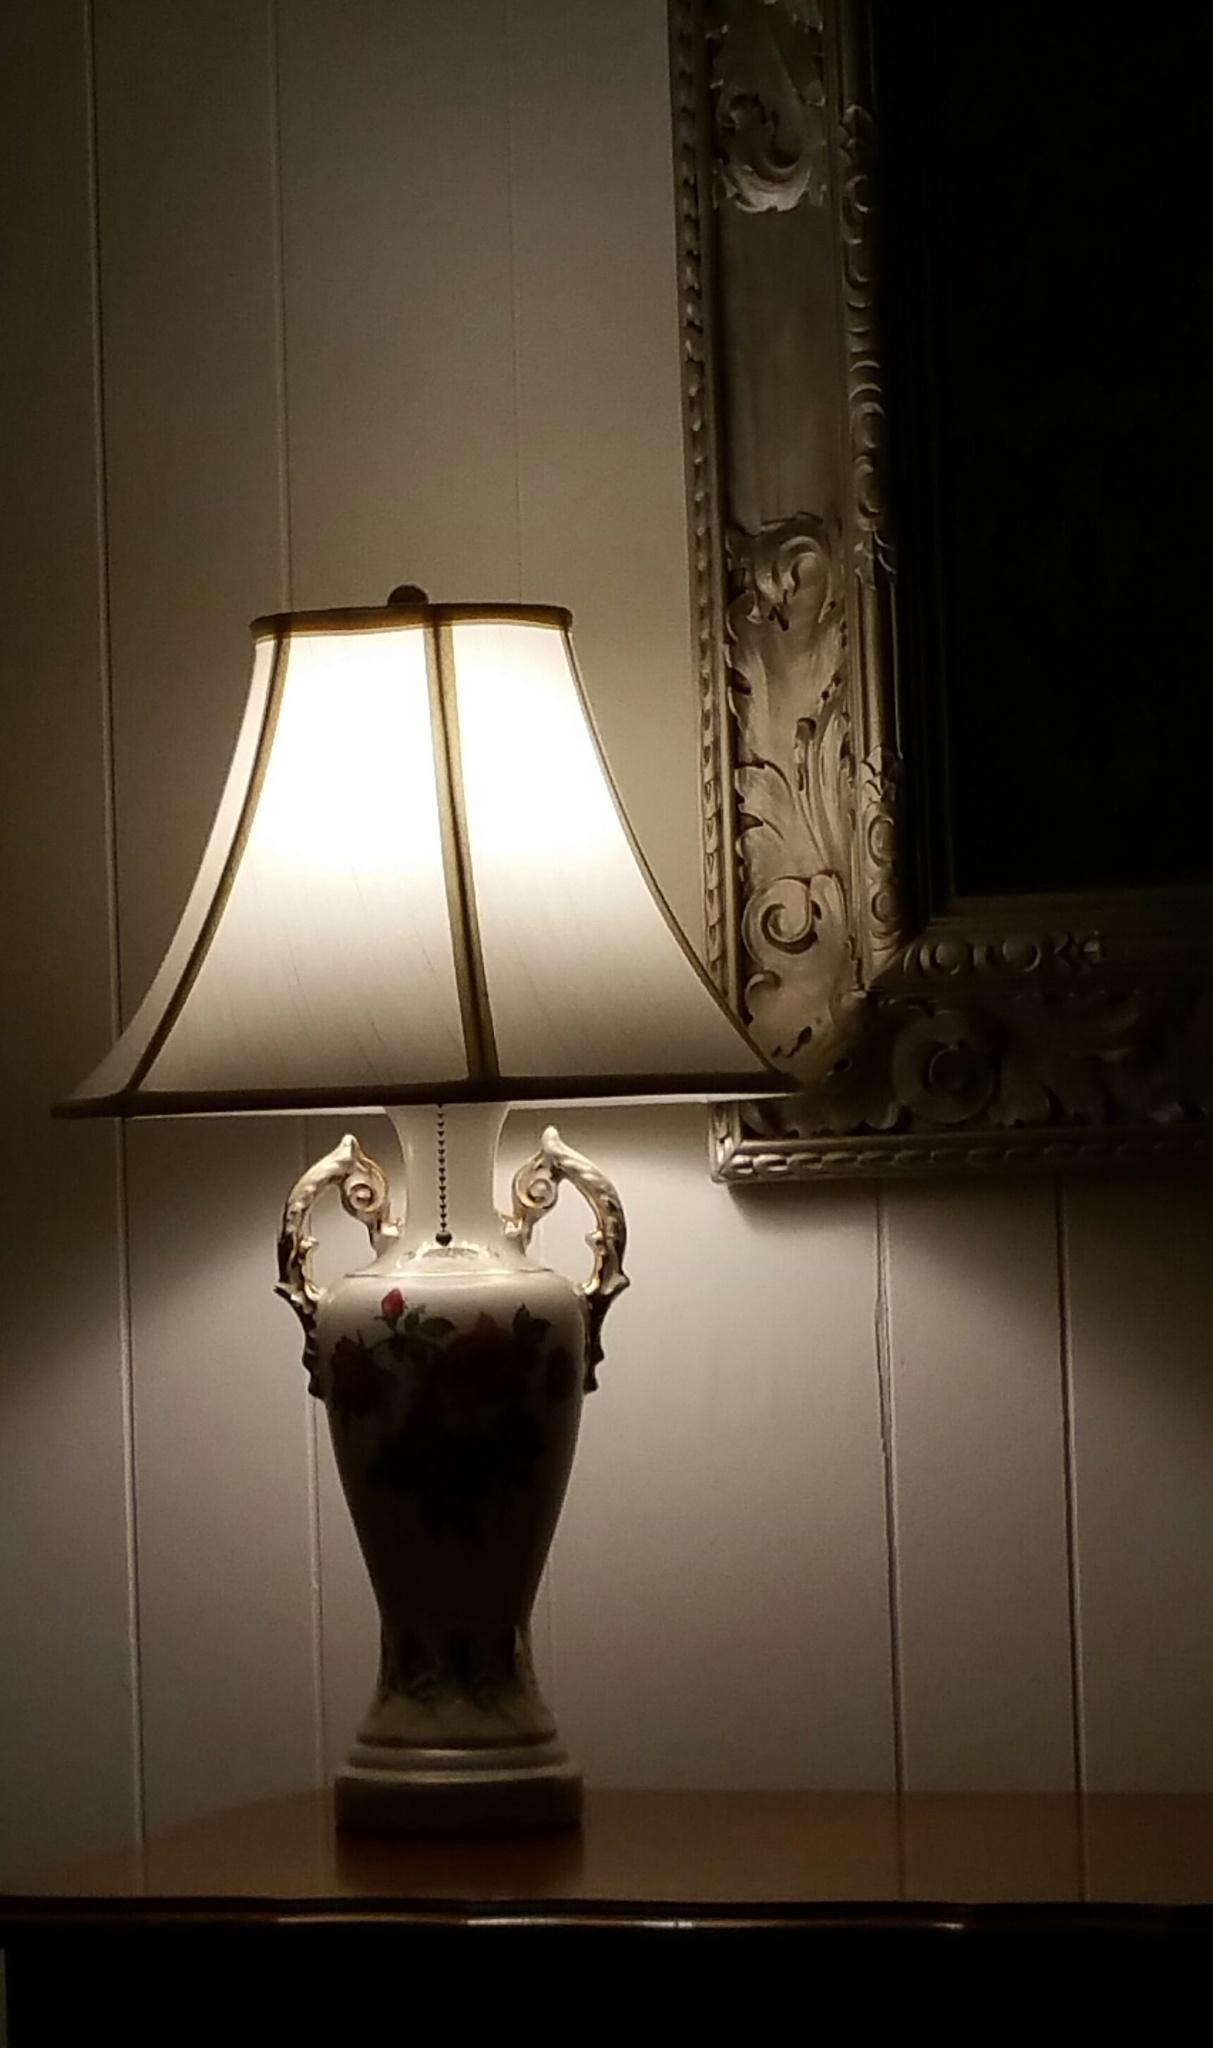 Lonely night by Trisha Crank